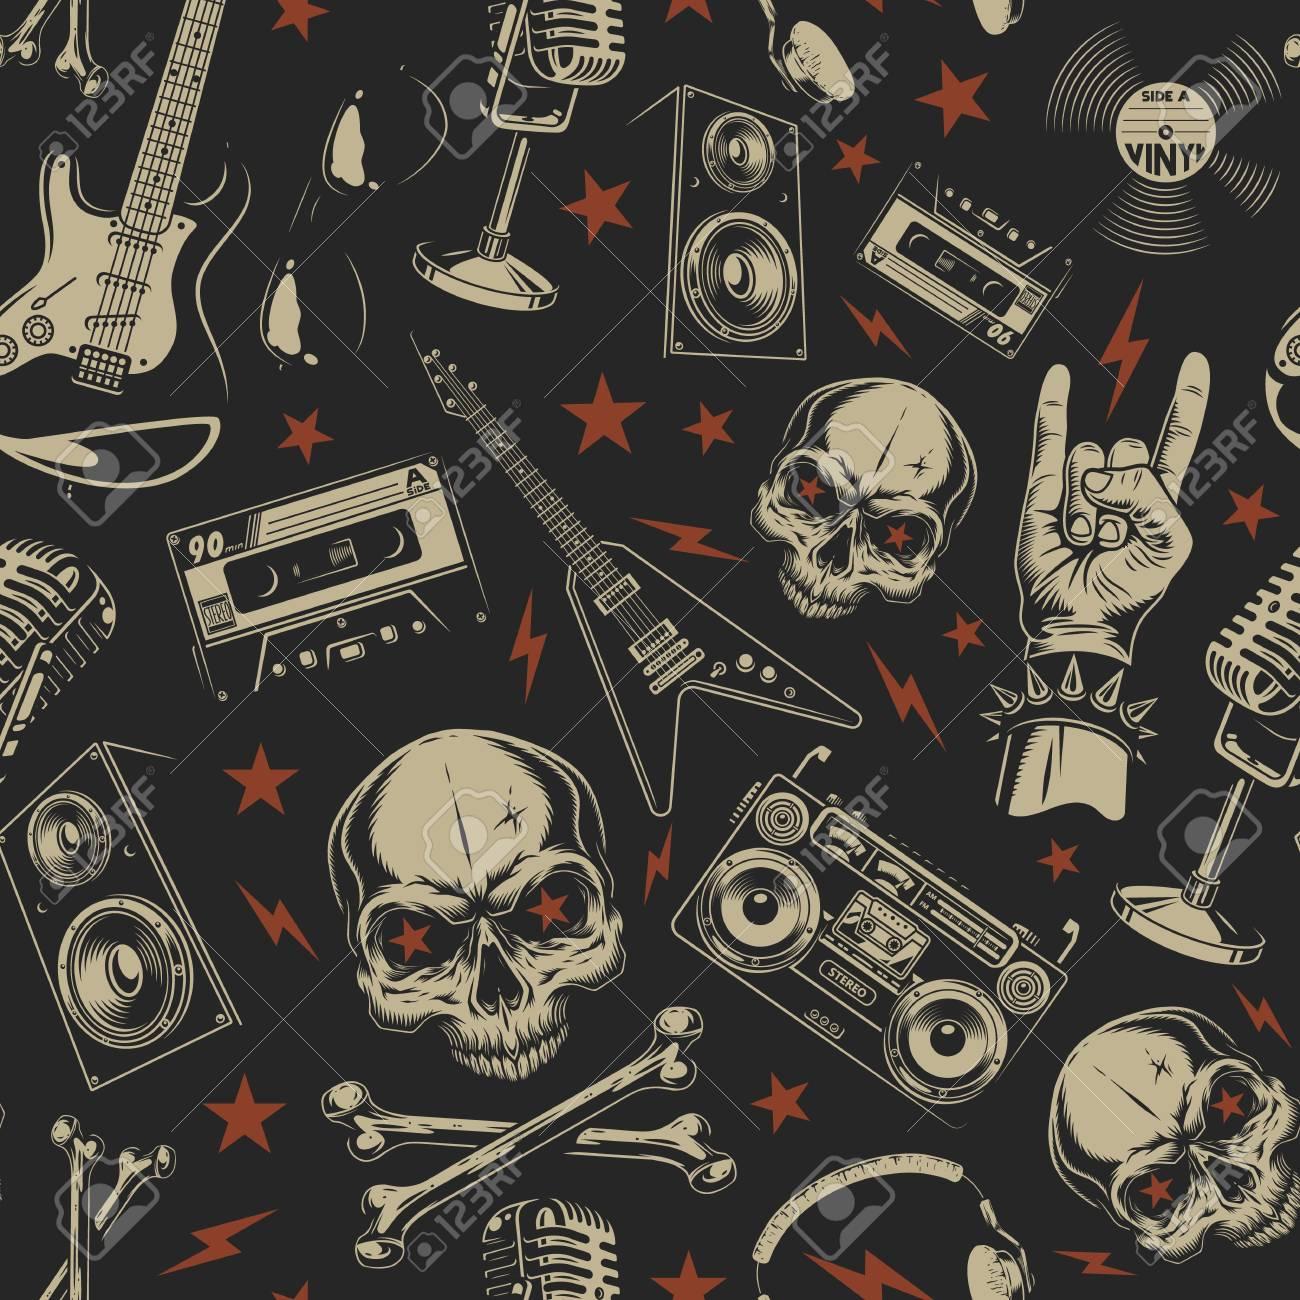 Grunge seamless pattern with skulls - 106054902